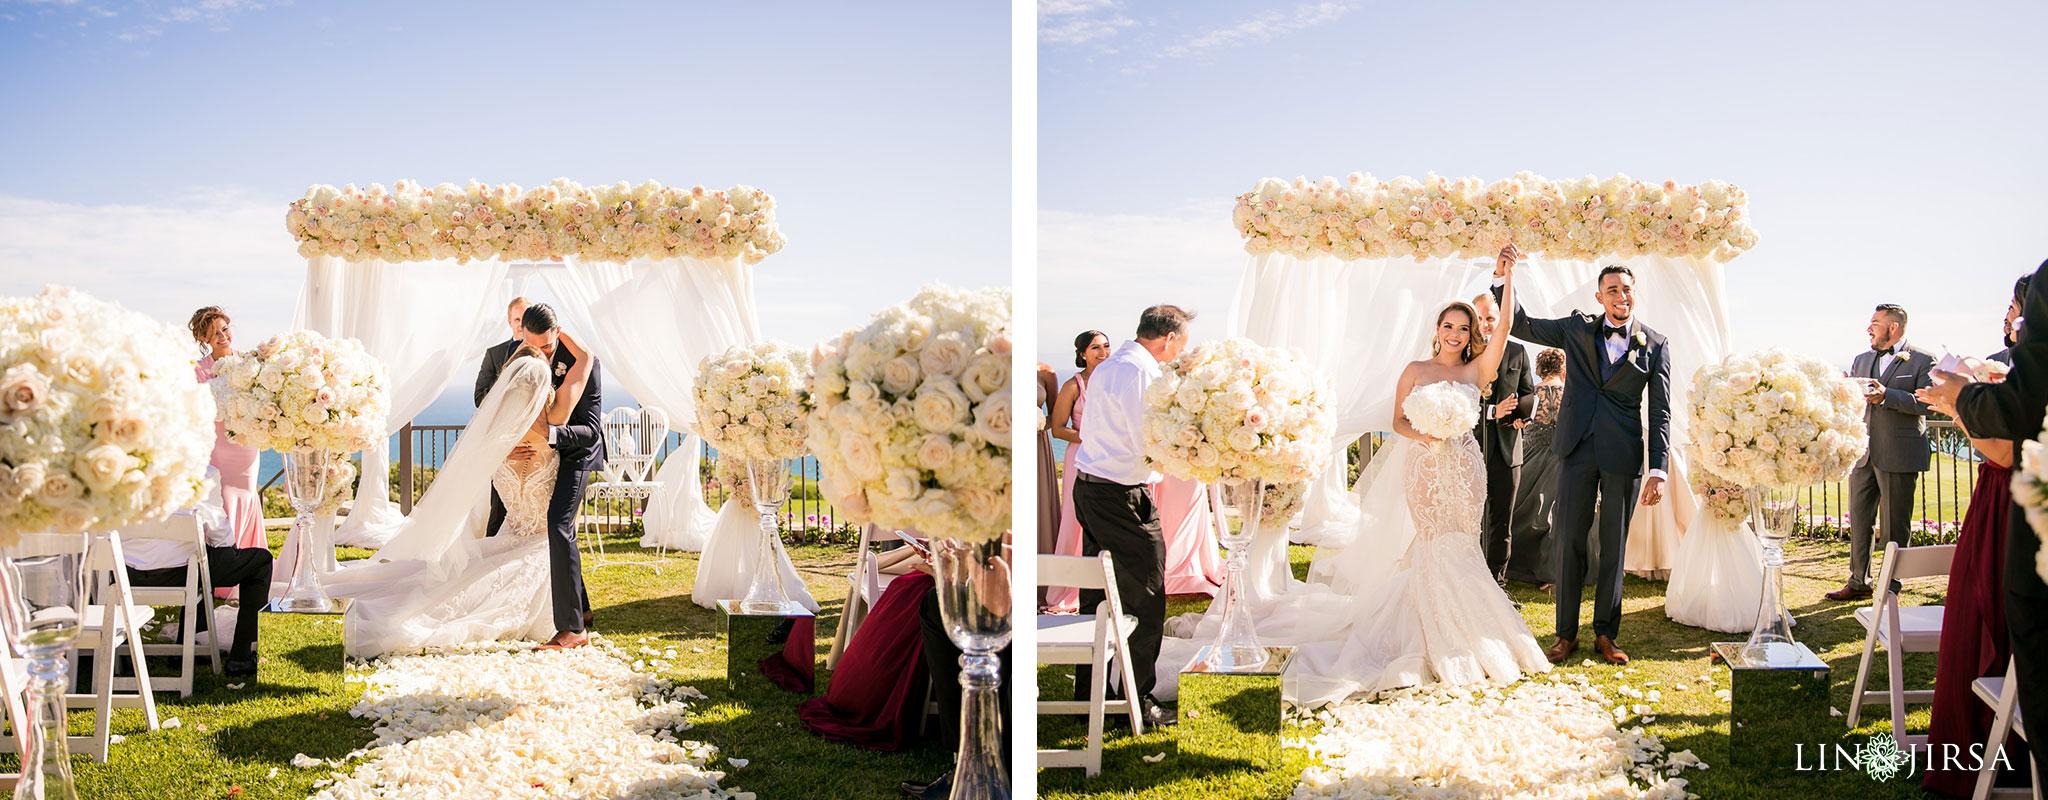 17 trump national golf course palos verdes wedding ceremony photography